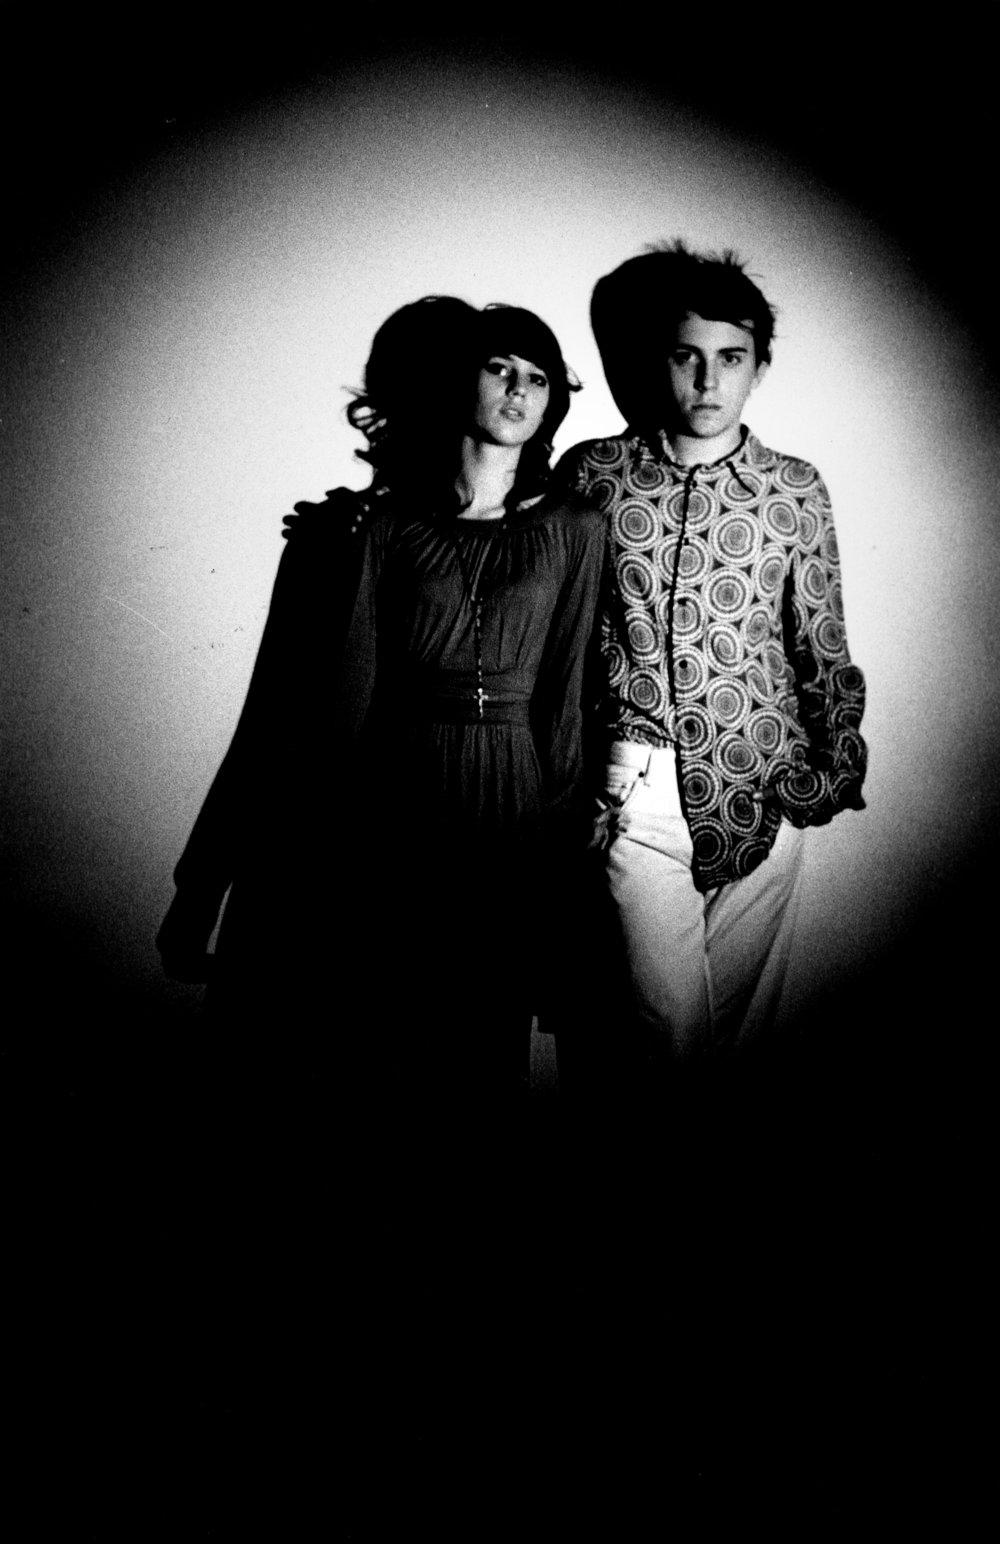 theo and bert in spotlight.jpg